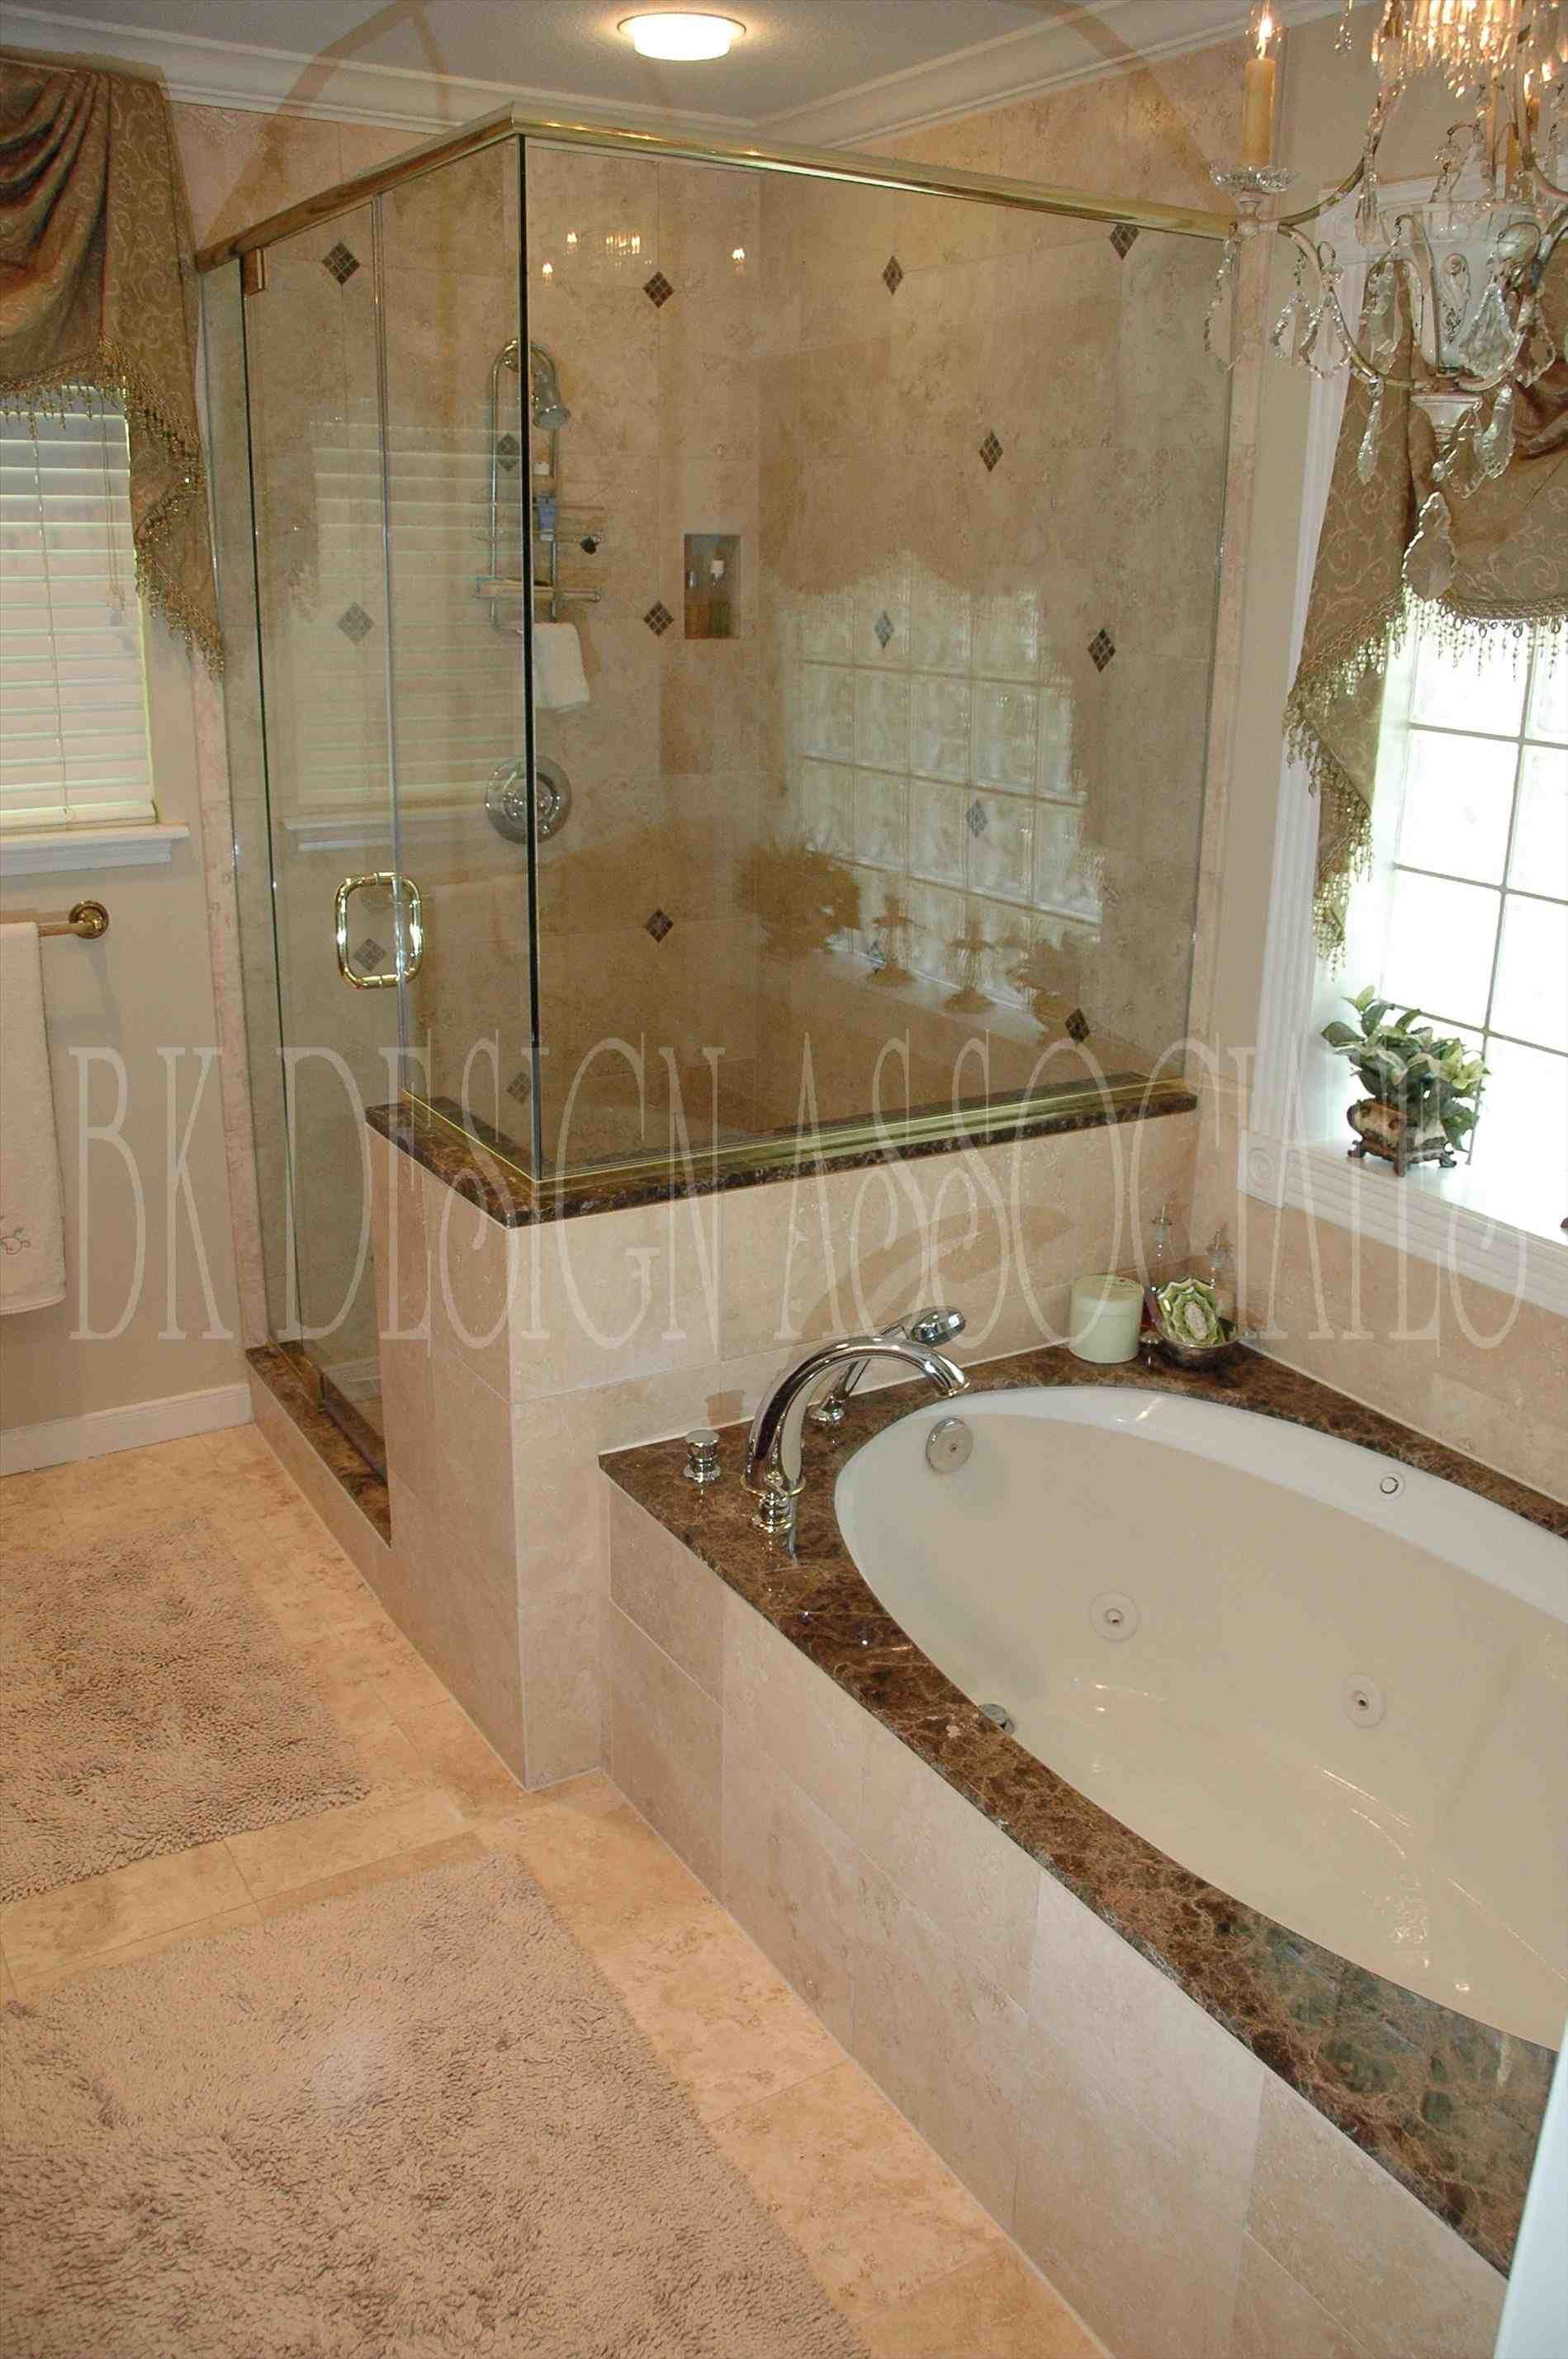 This Bath Shower Combo Small Bathroom  Design For Small Bathroom Classy Shower Design Ideas Small Bathroom Inspiration Design